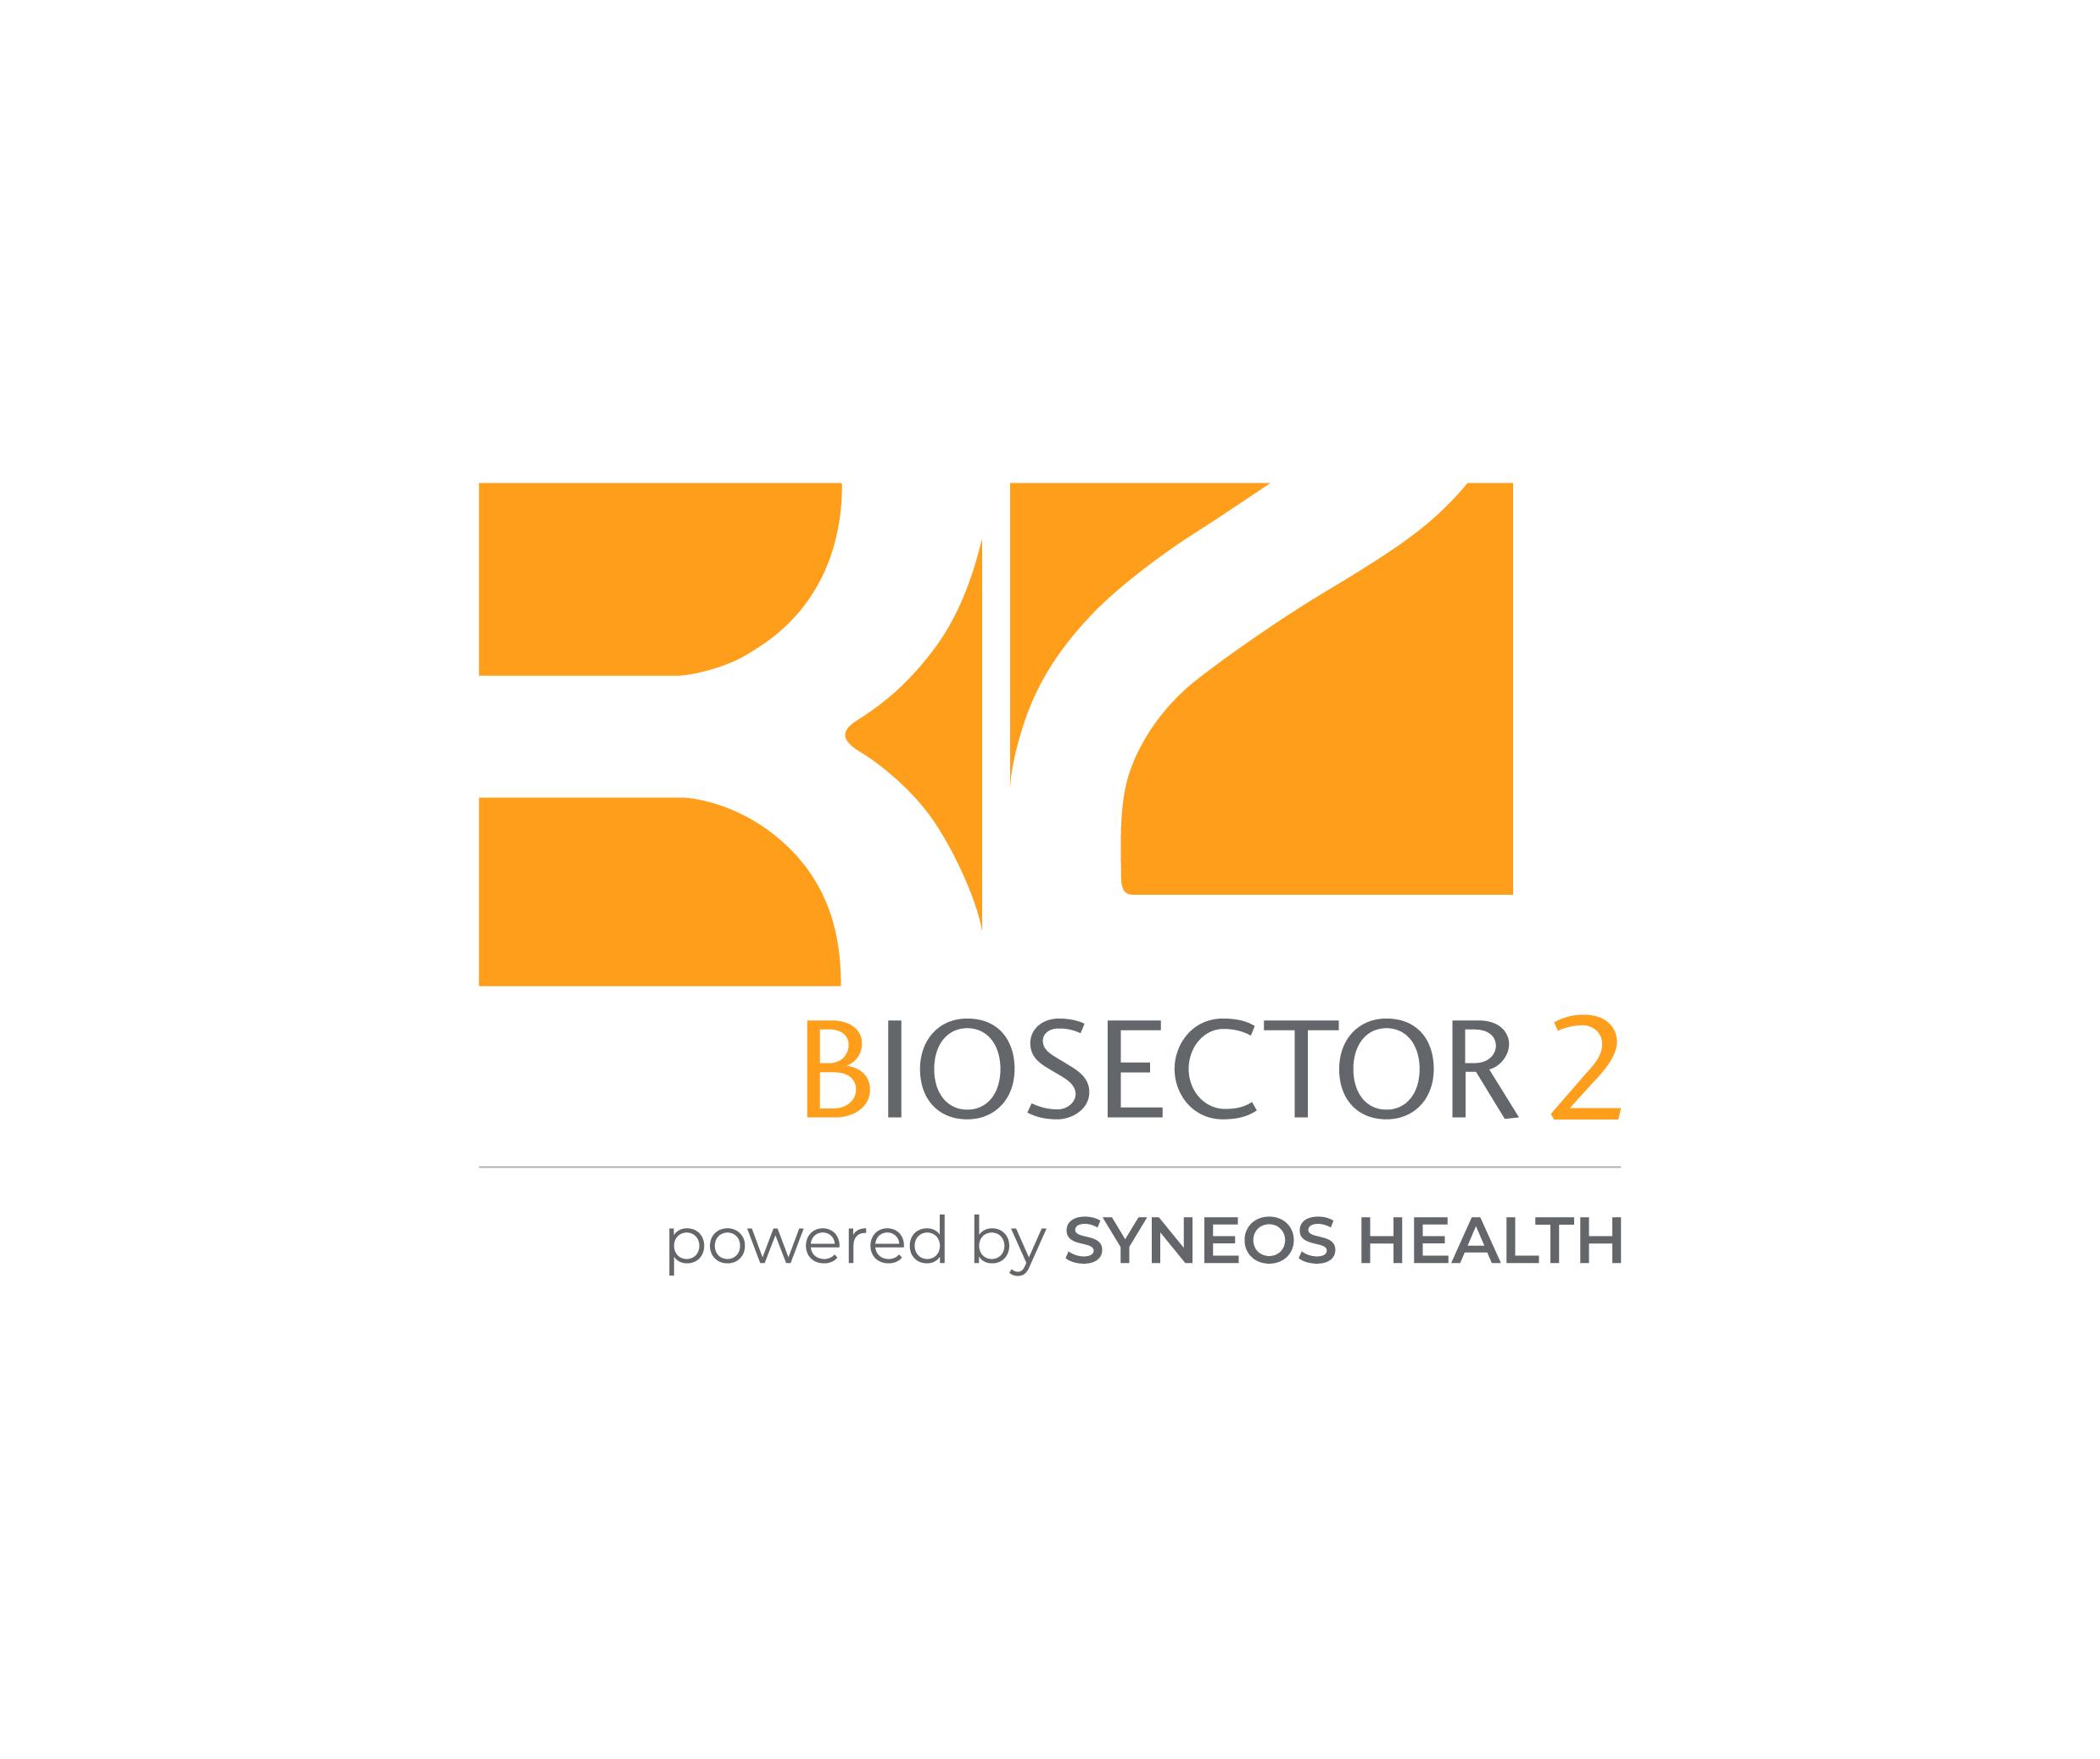 Biosector 2 logo